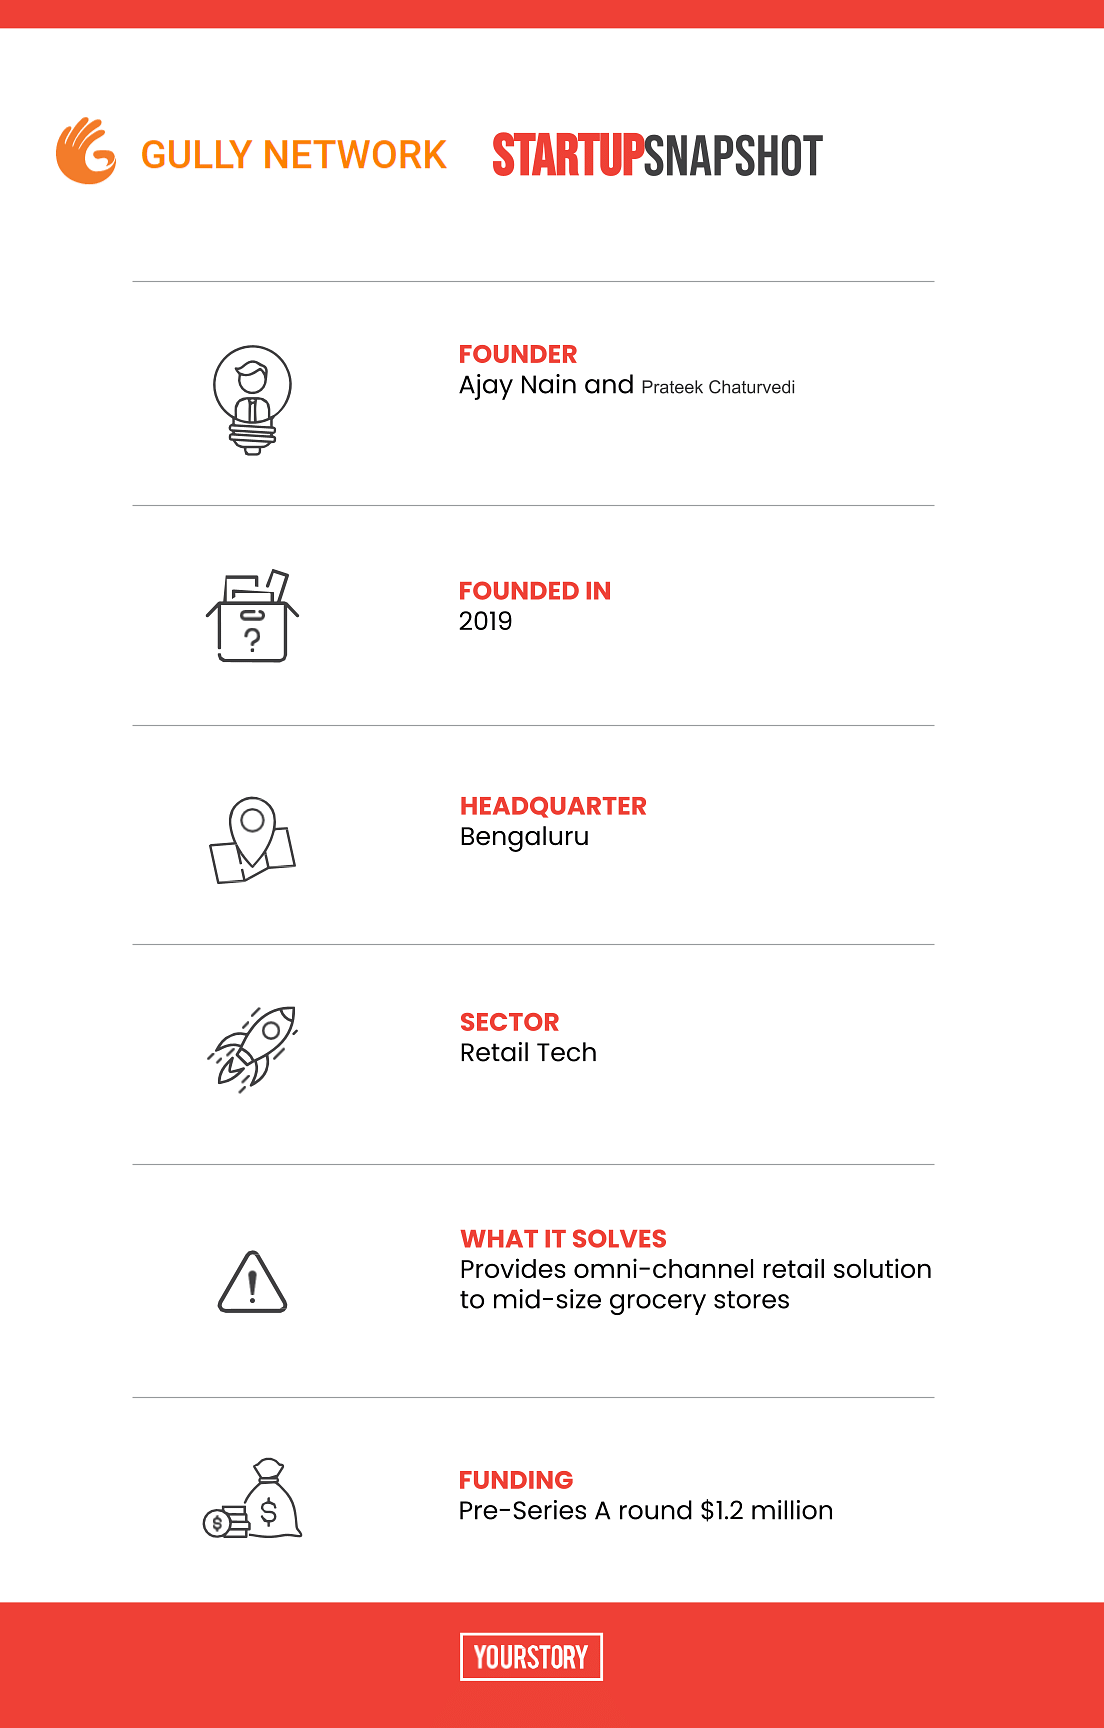 Gully Network Startup Snapshot